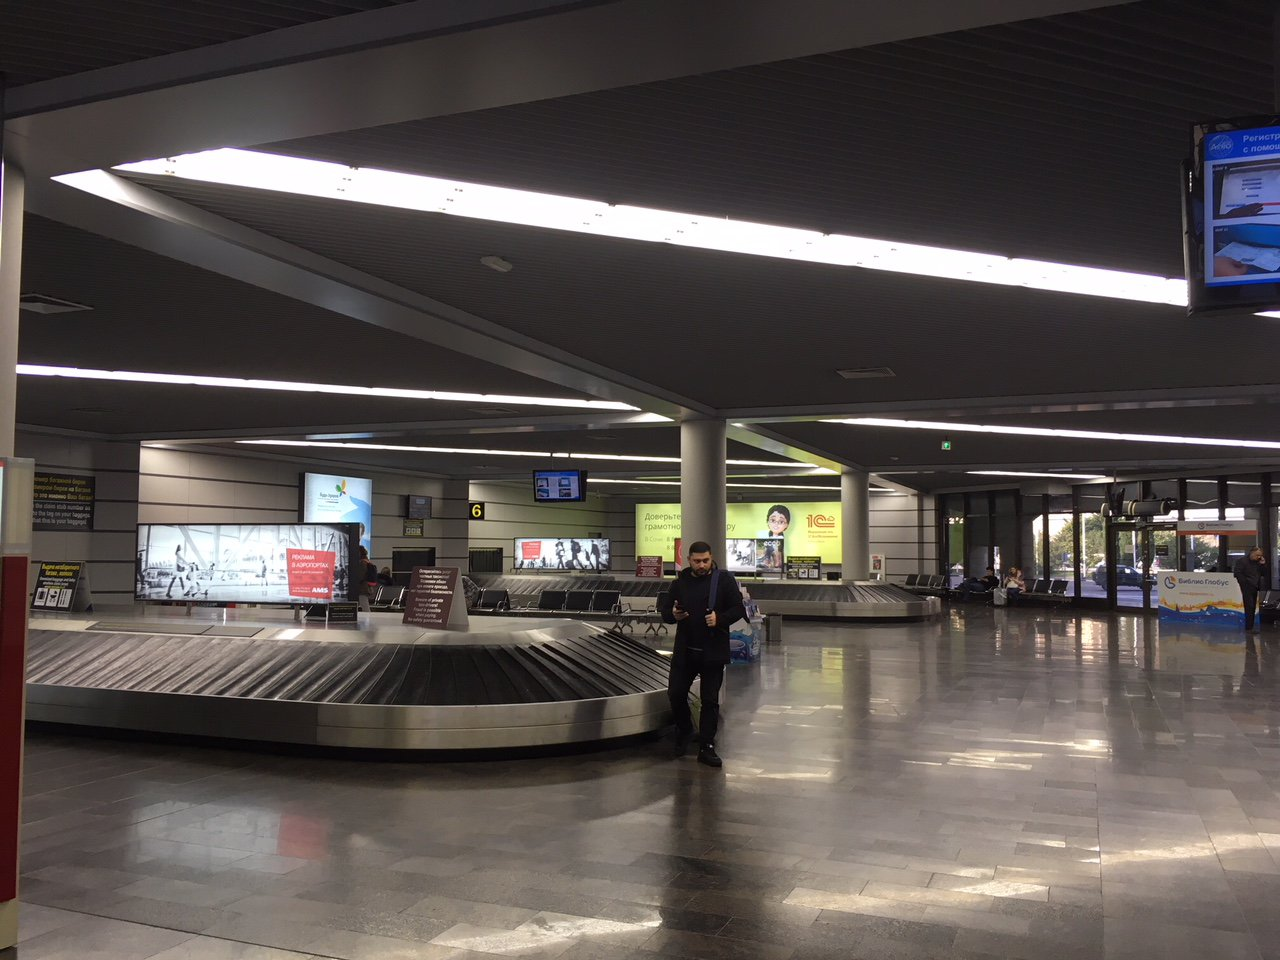 Зал выдачи багажа в аэропорту Сочи